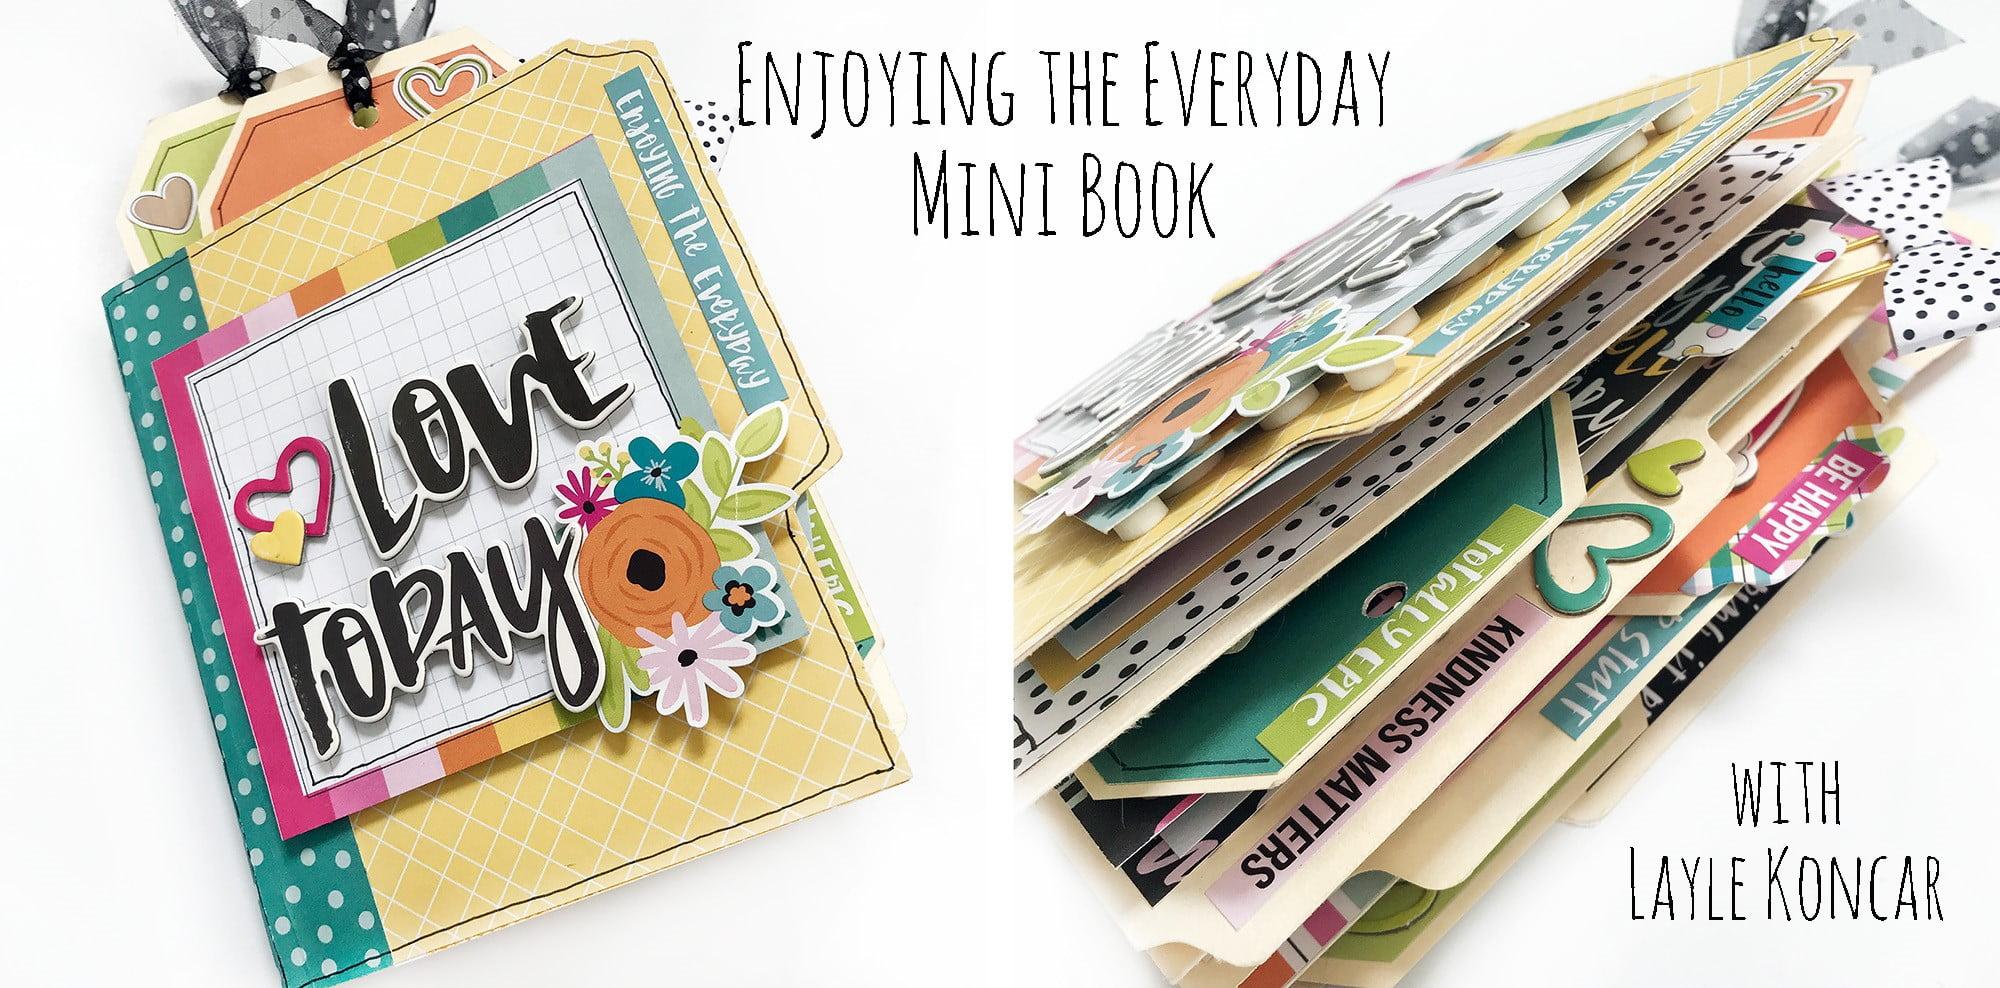 Enjoying the Everyday – File Folder Mini Book with Layle Koncar